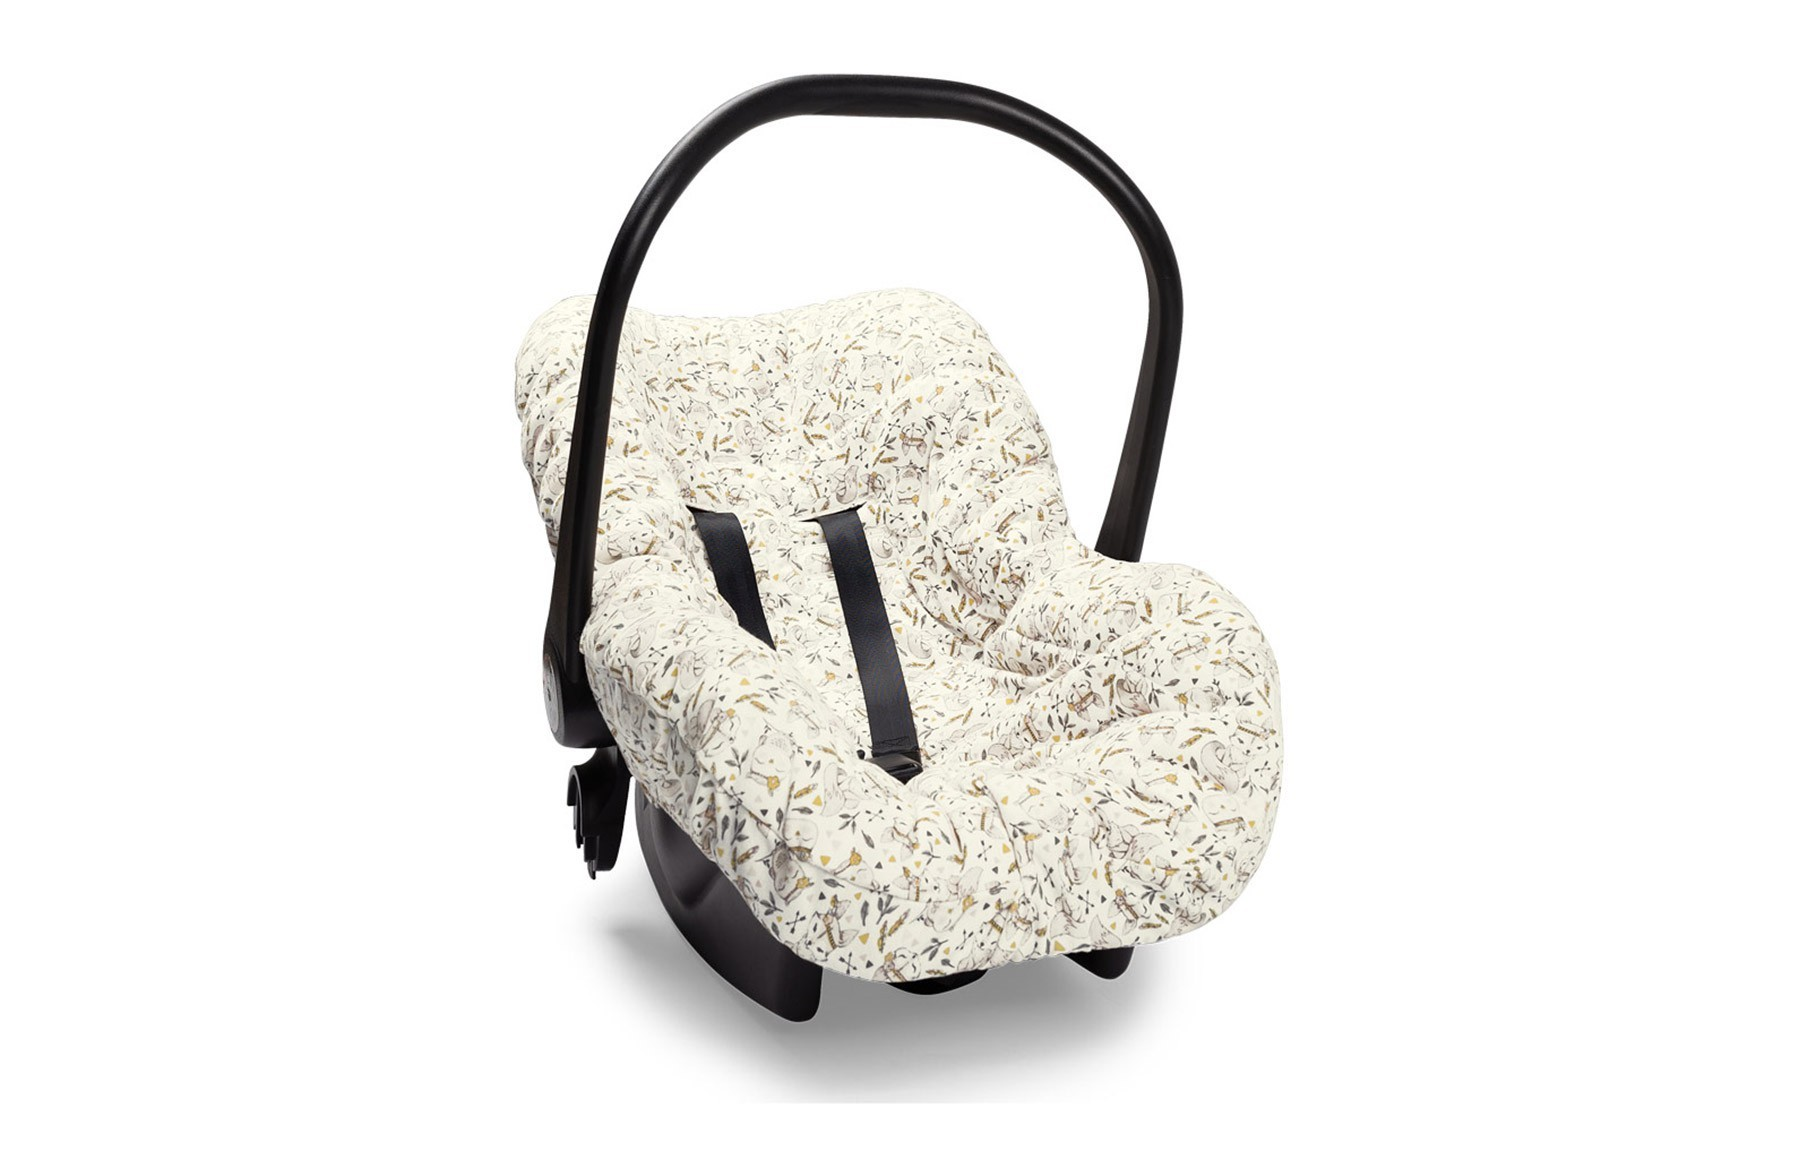 Capa De Bebê Conforto Floresta Encantada Rosa